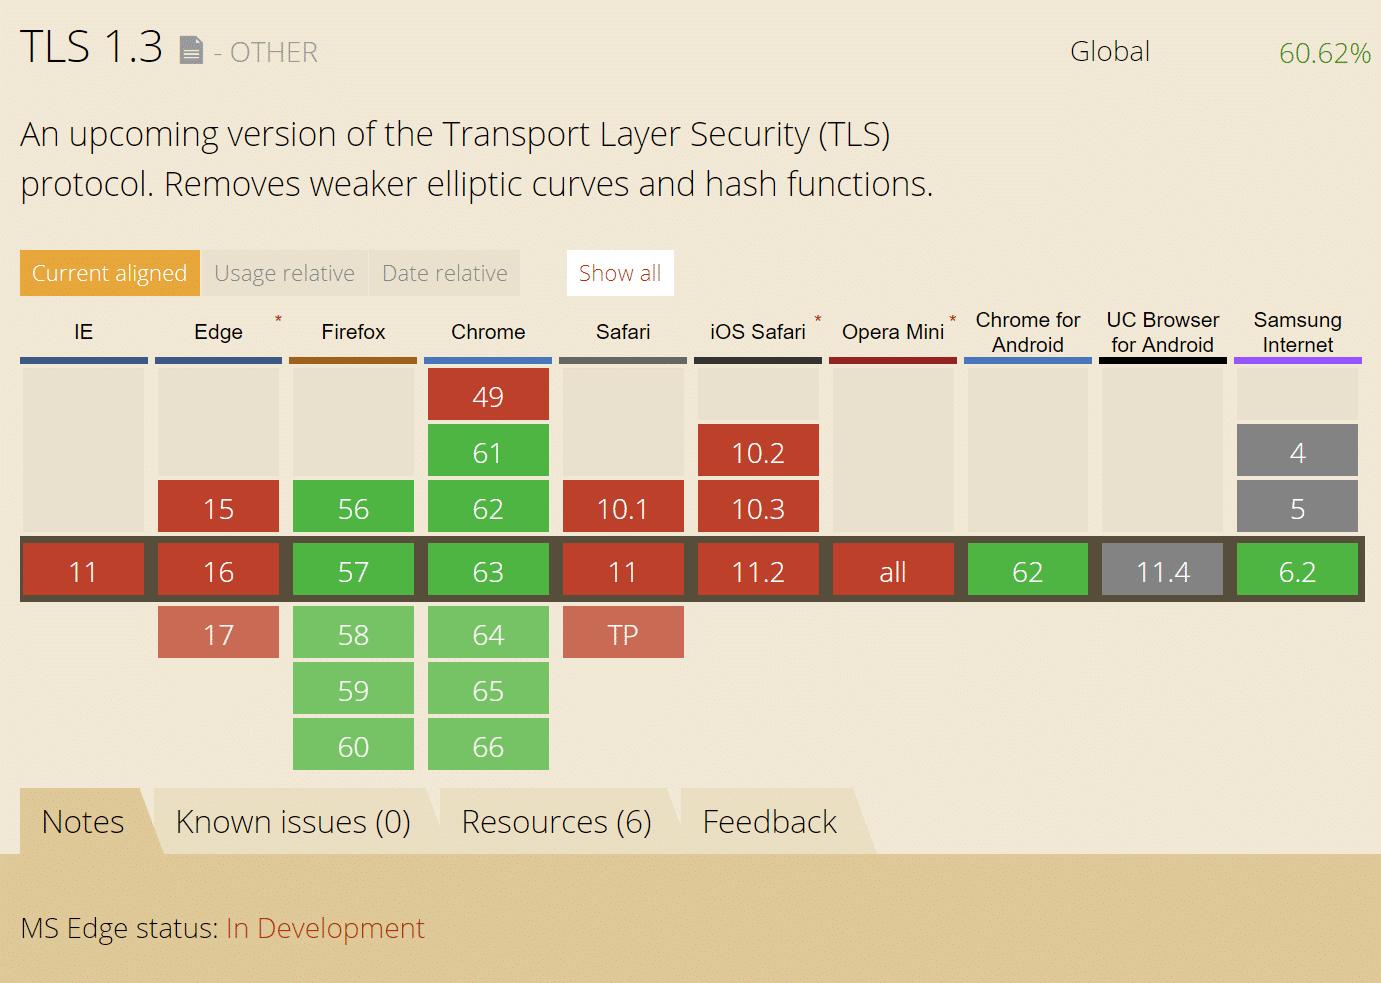 Soporte para navegadores de TLS 1.3